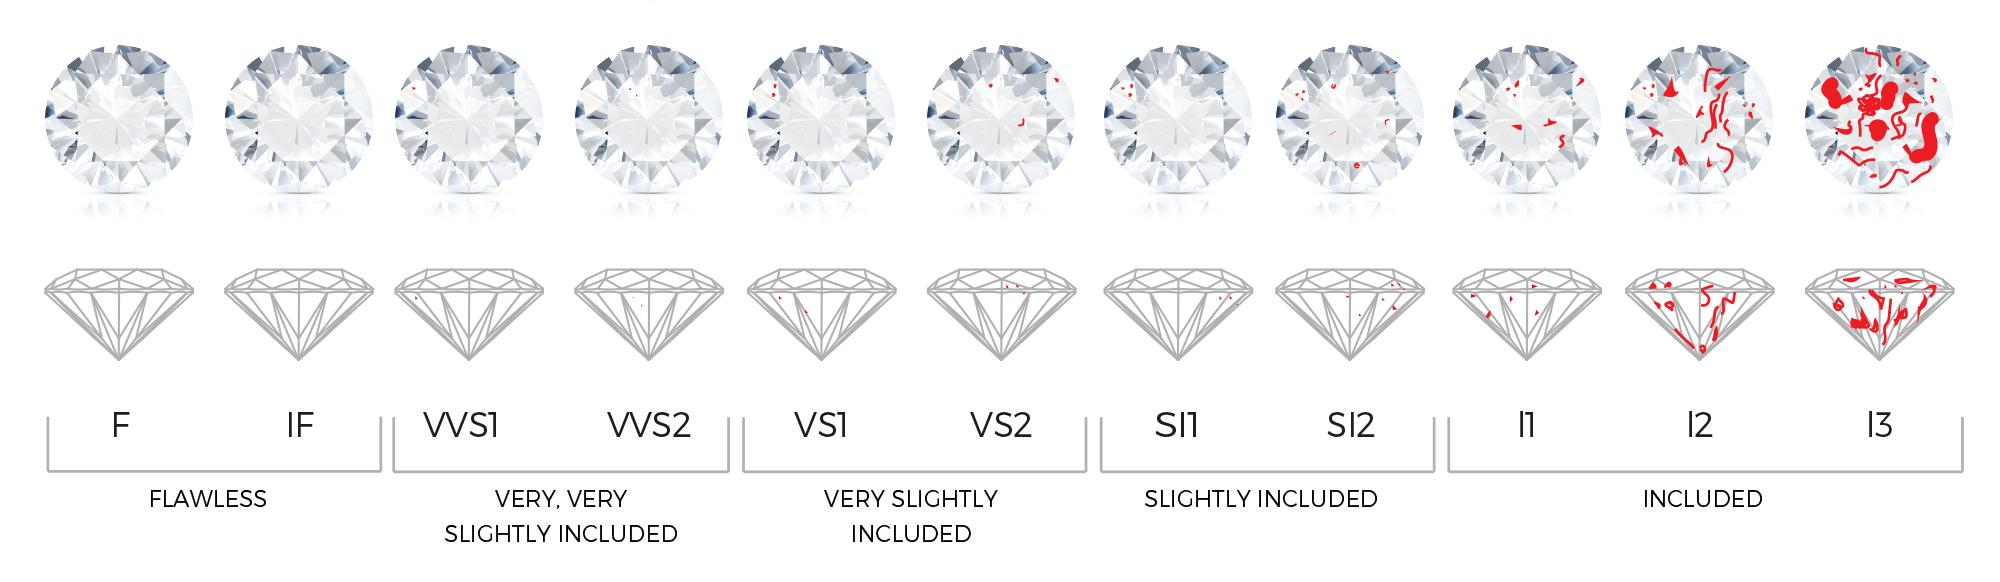 diamond clarity graded